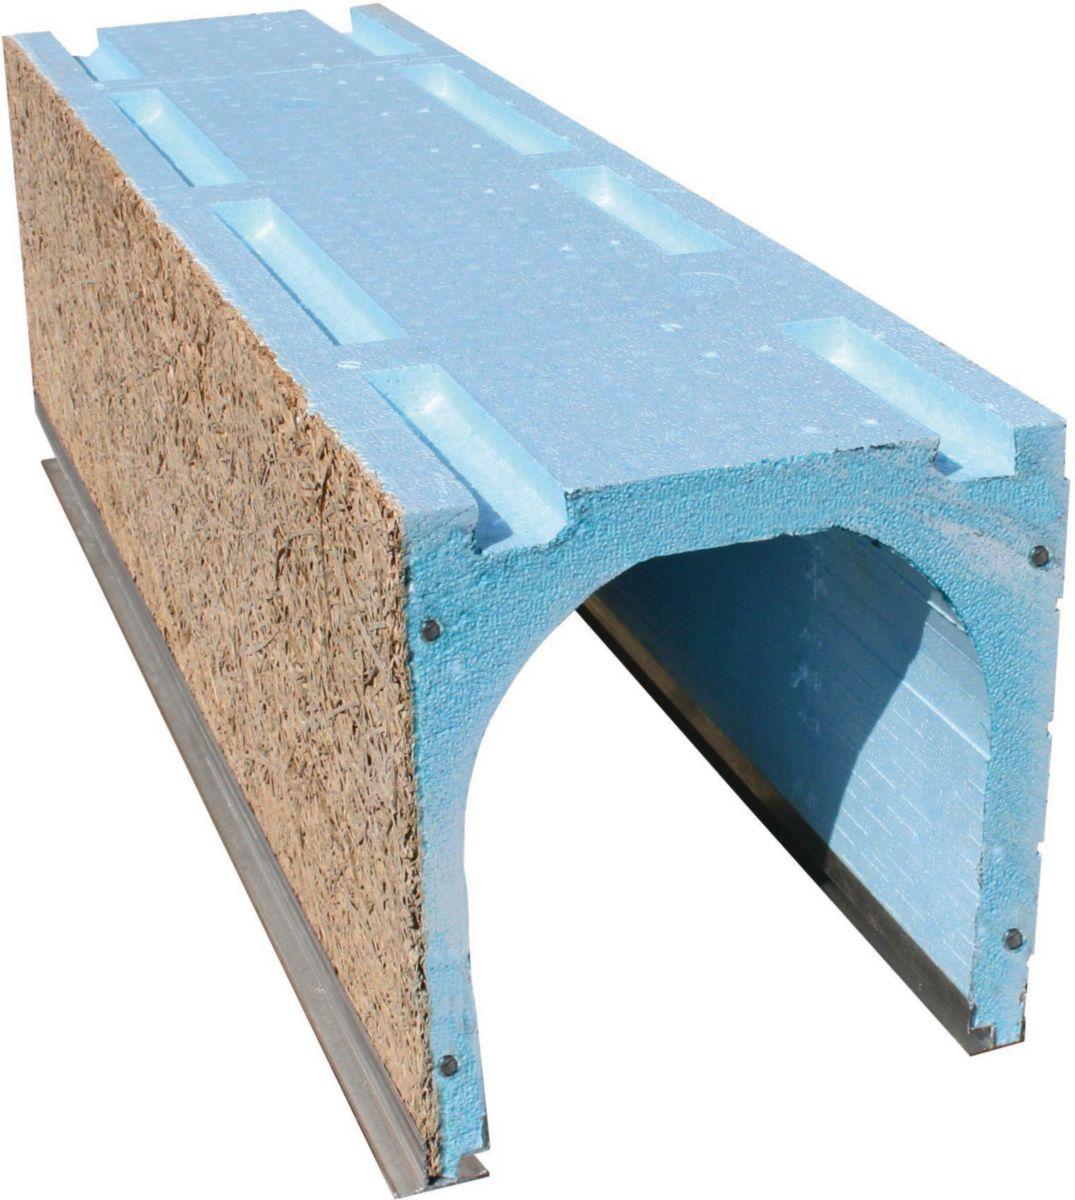 c2r coffre tunnel polystyr ne face fibre 280mm x900mm. Black Bedroom Furniture Sets. Home Design Ideas